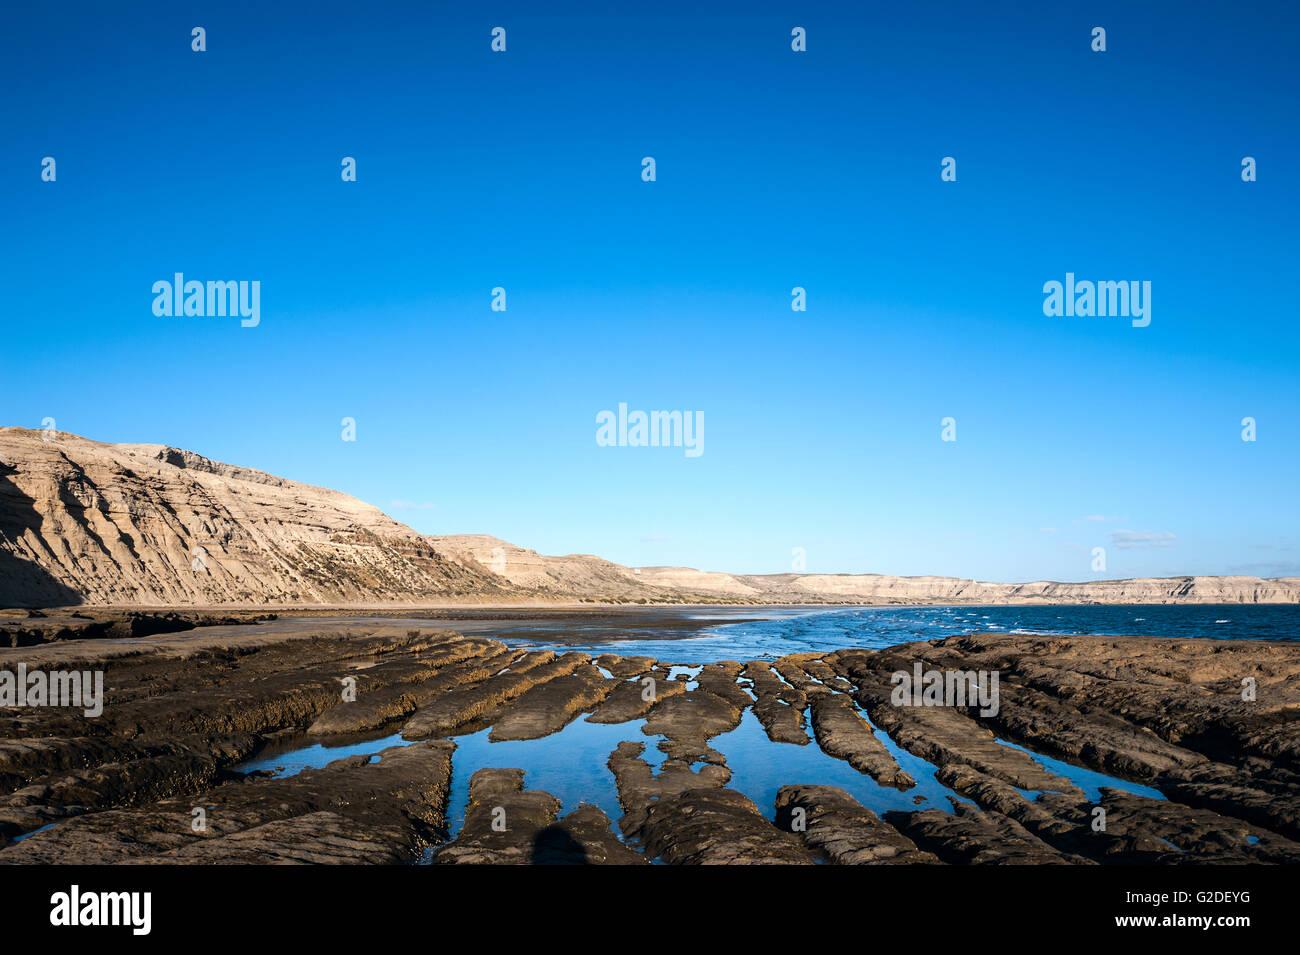 La costa de la Patagonia, Península Valdés, Argentina Imagen De Stock